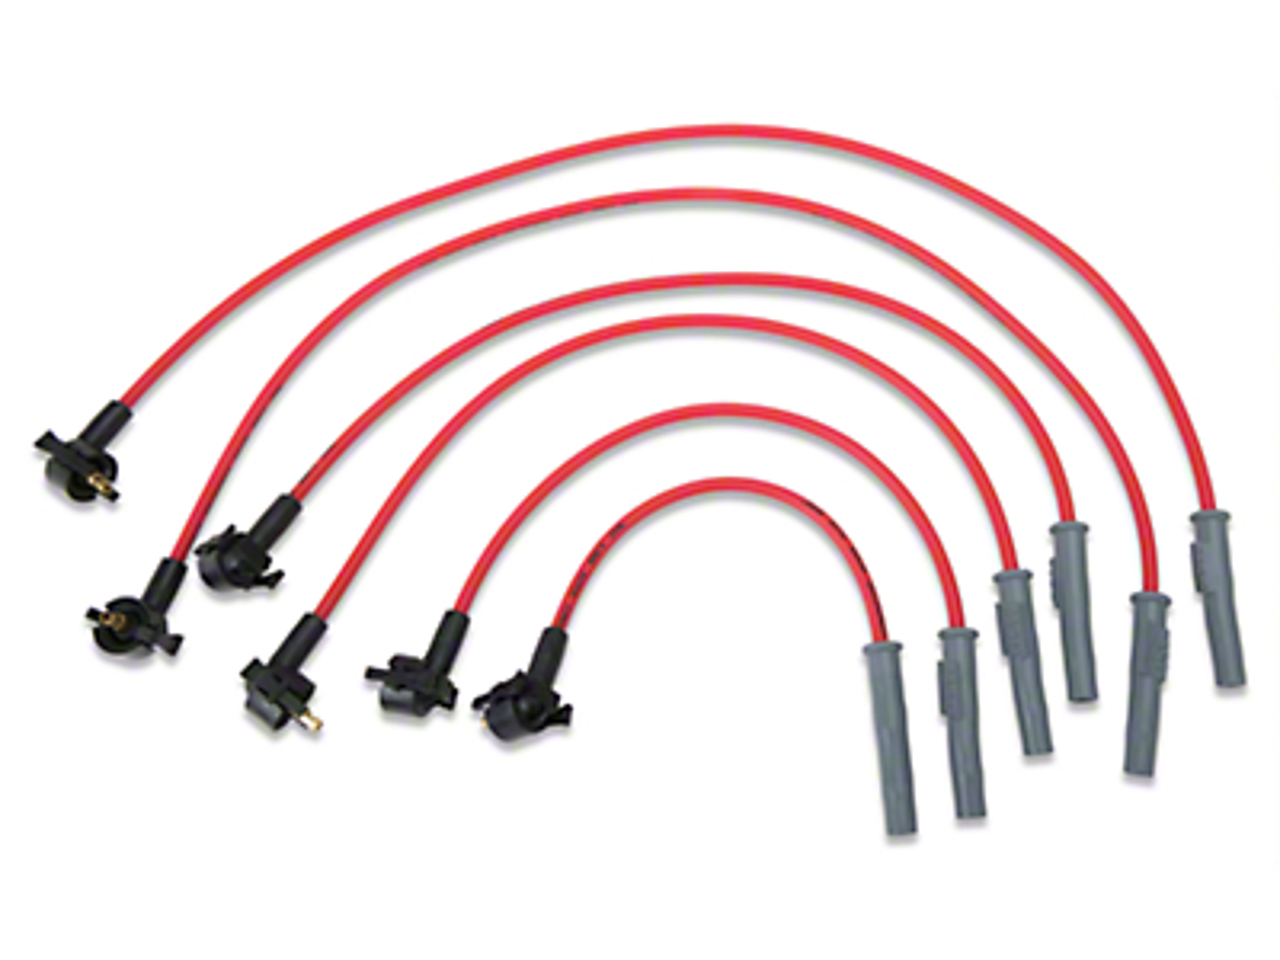 MSD Super Conductor 8.5mm Spark Plug Wires - Red (94-98 V6)